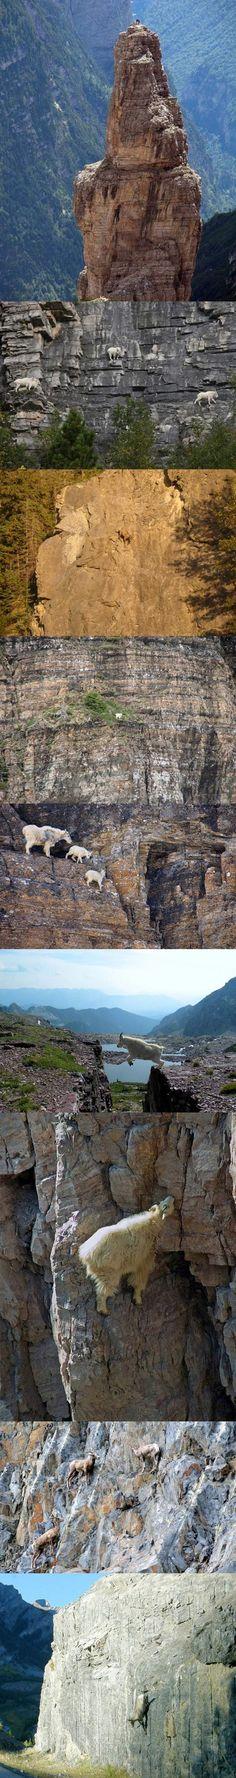 Goats climbing mountains